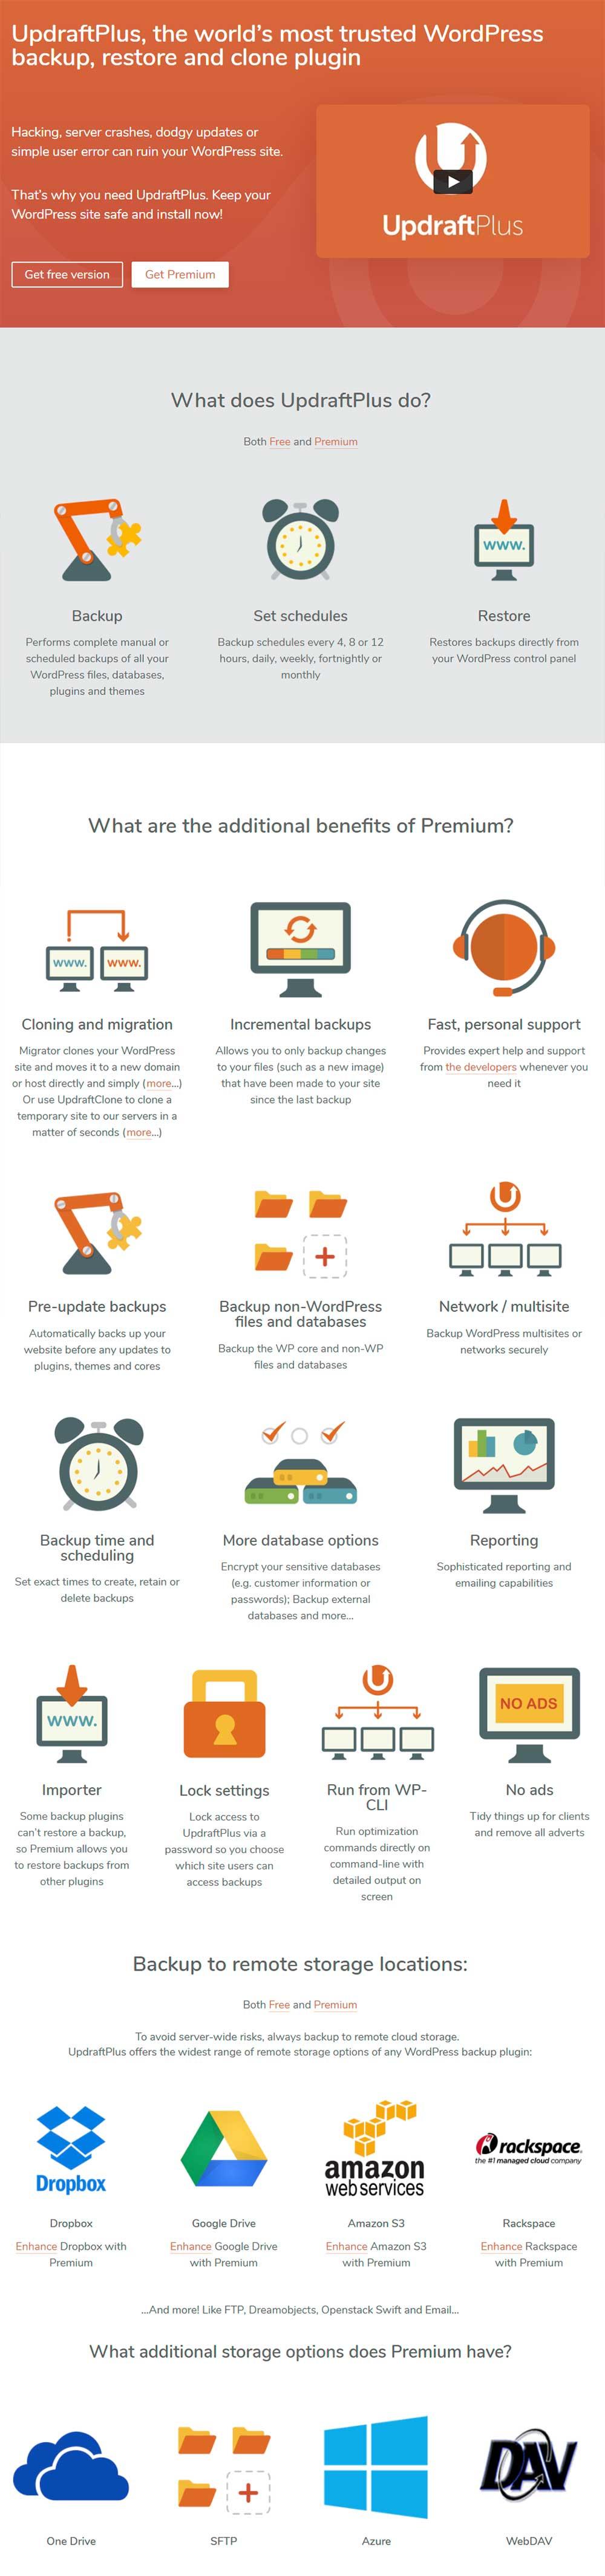 UpdraftPlus - WordPress Backup Plugin